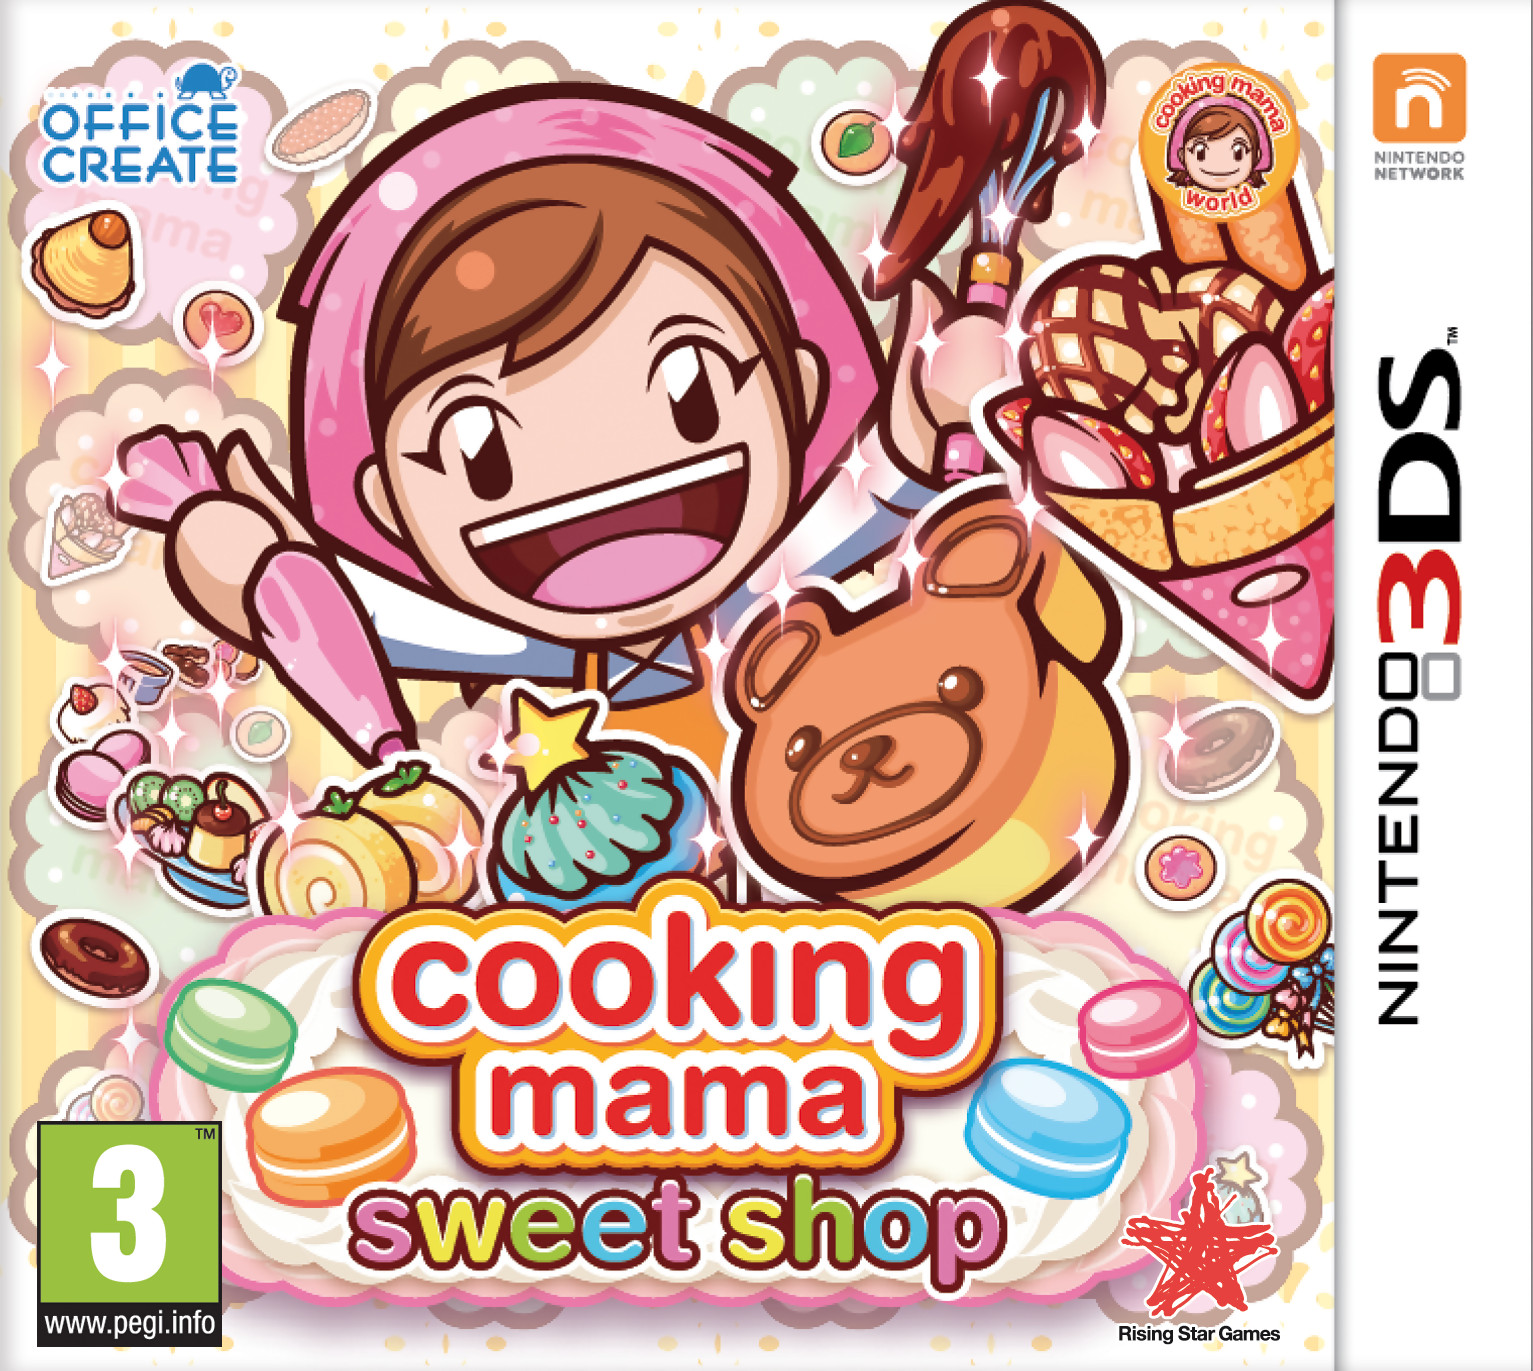 Cooking mama sweet shop trailer de gameplay sur 3ds - Jeu de cuisine cooking mama ...